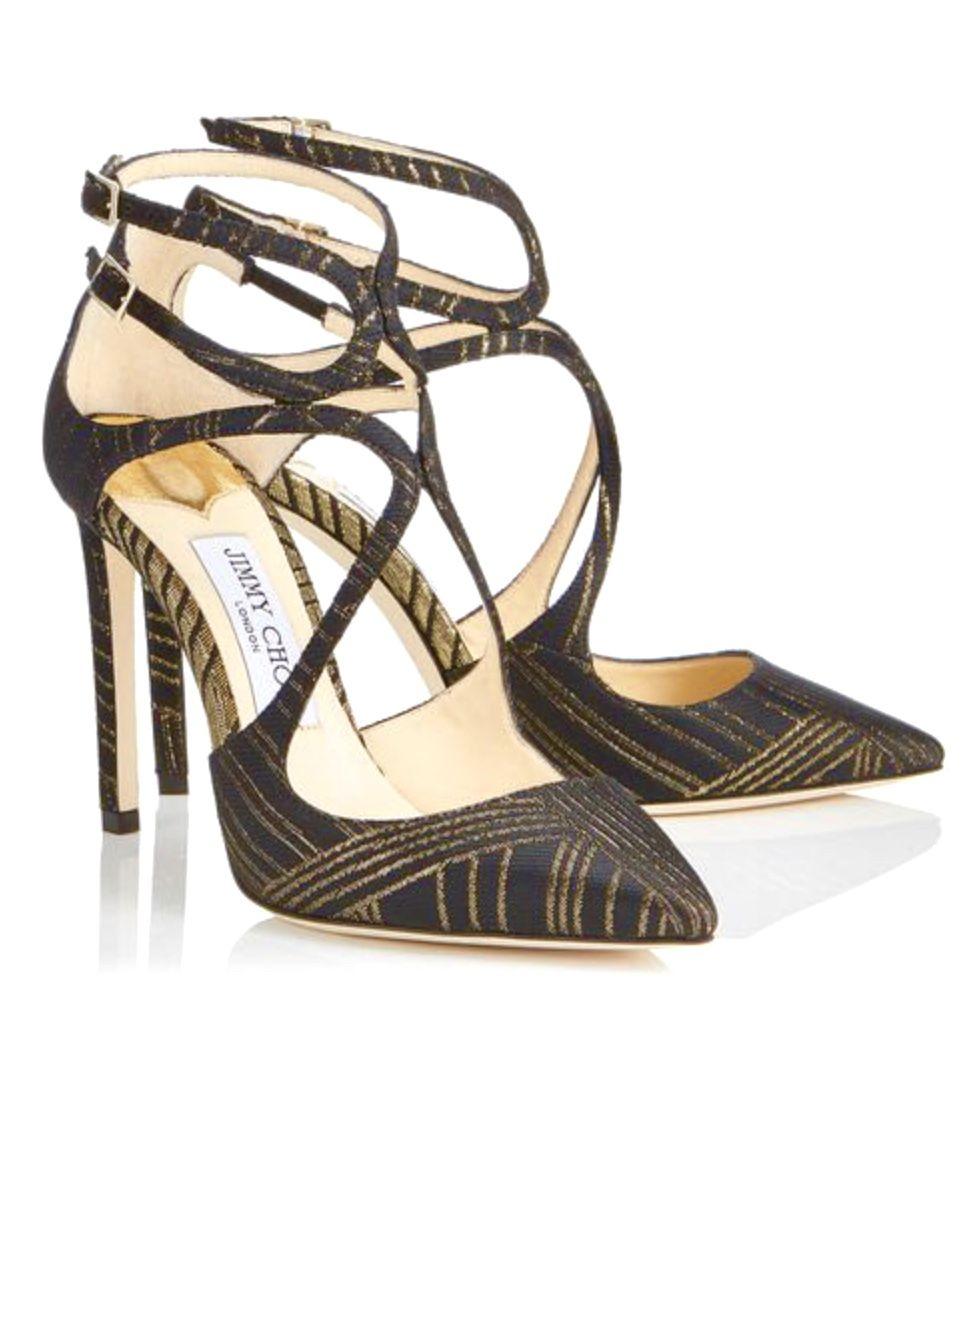 Sexy shoe graphic